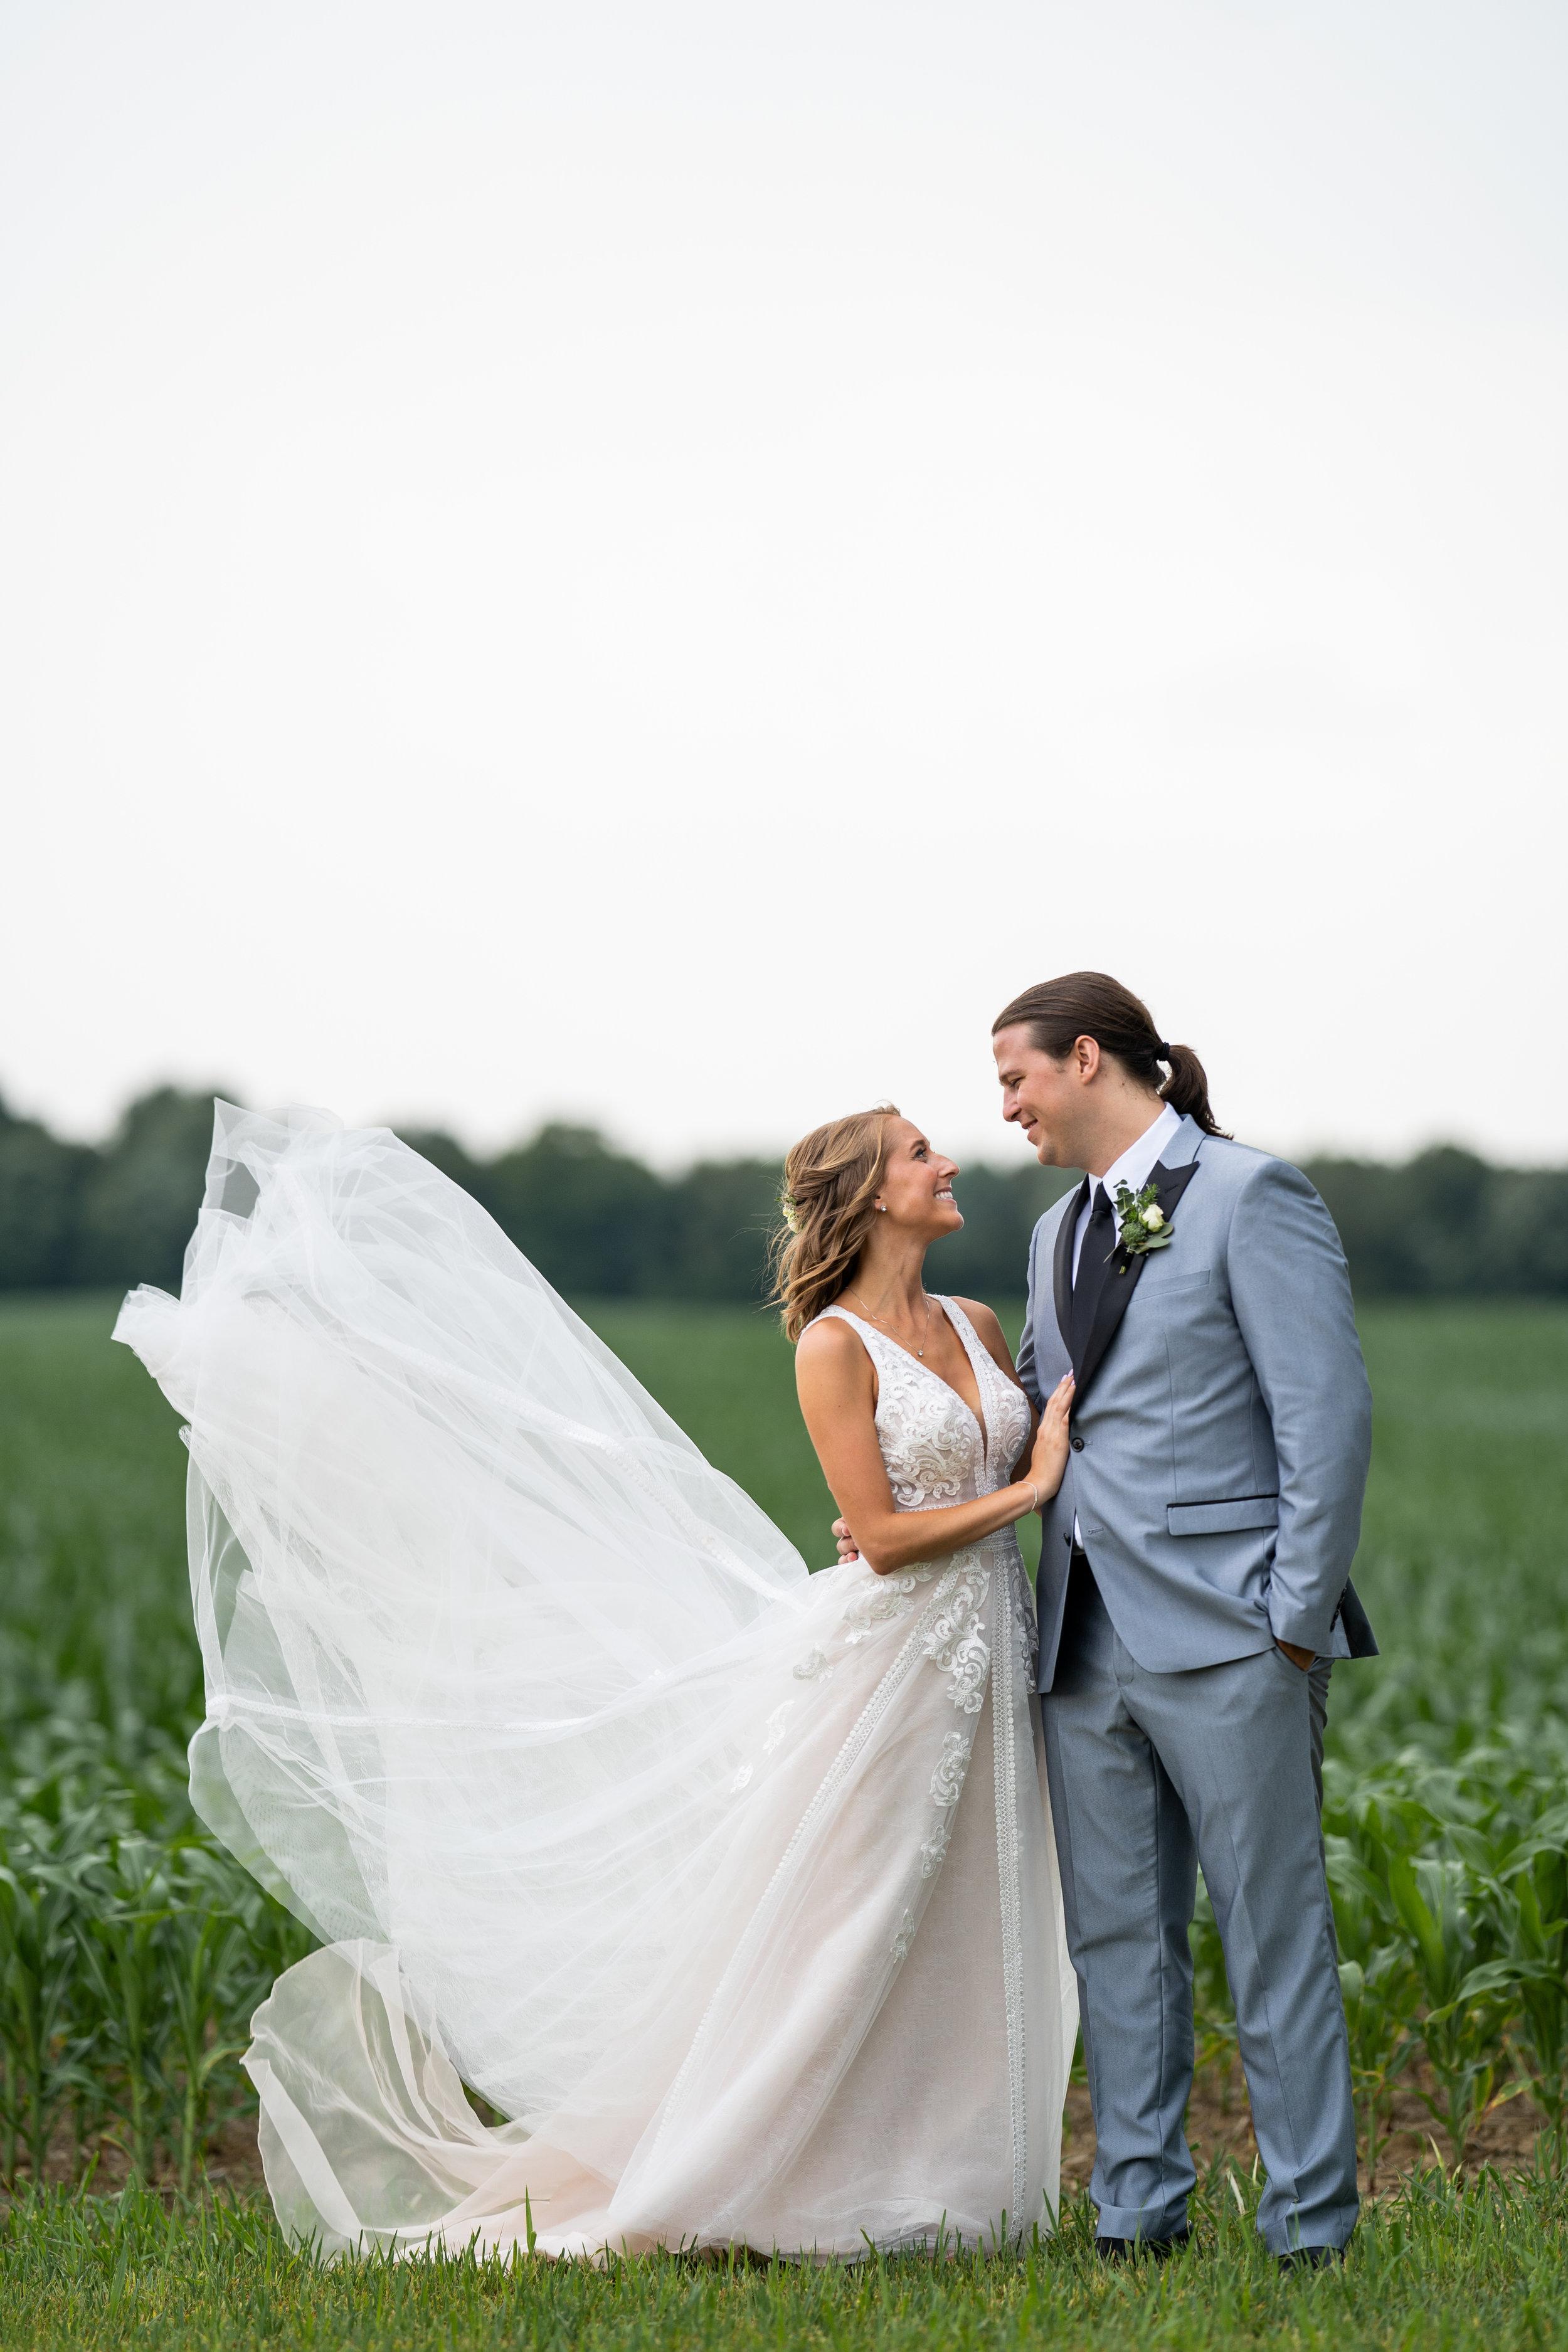 Bear Creative Co, Columbus Ohio Photographer, Columbus Ohio Wedding Photographer, Autumn Lakes, Campground Wedding, Columbus Ohio, Destination Photographer